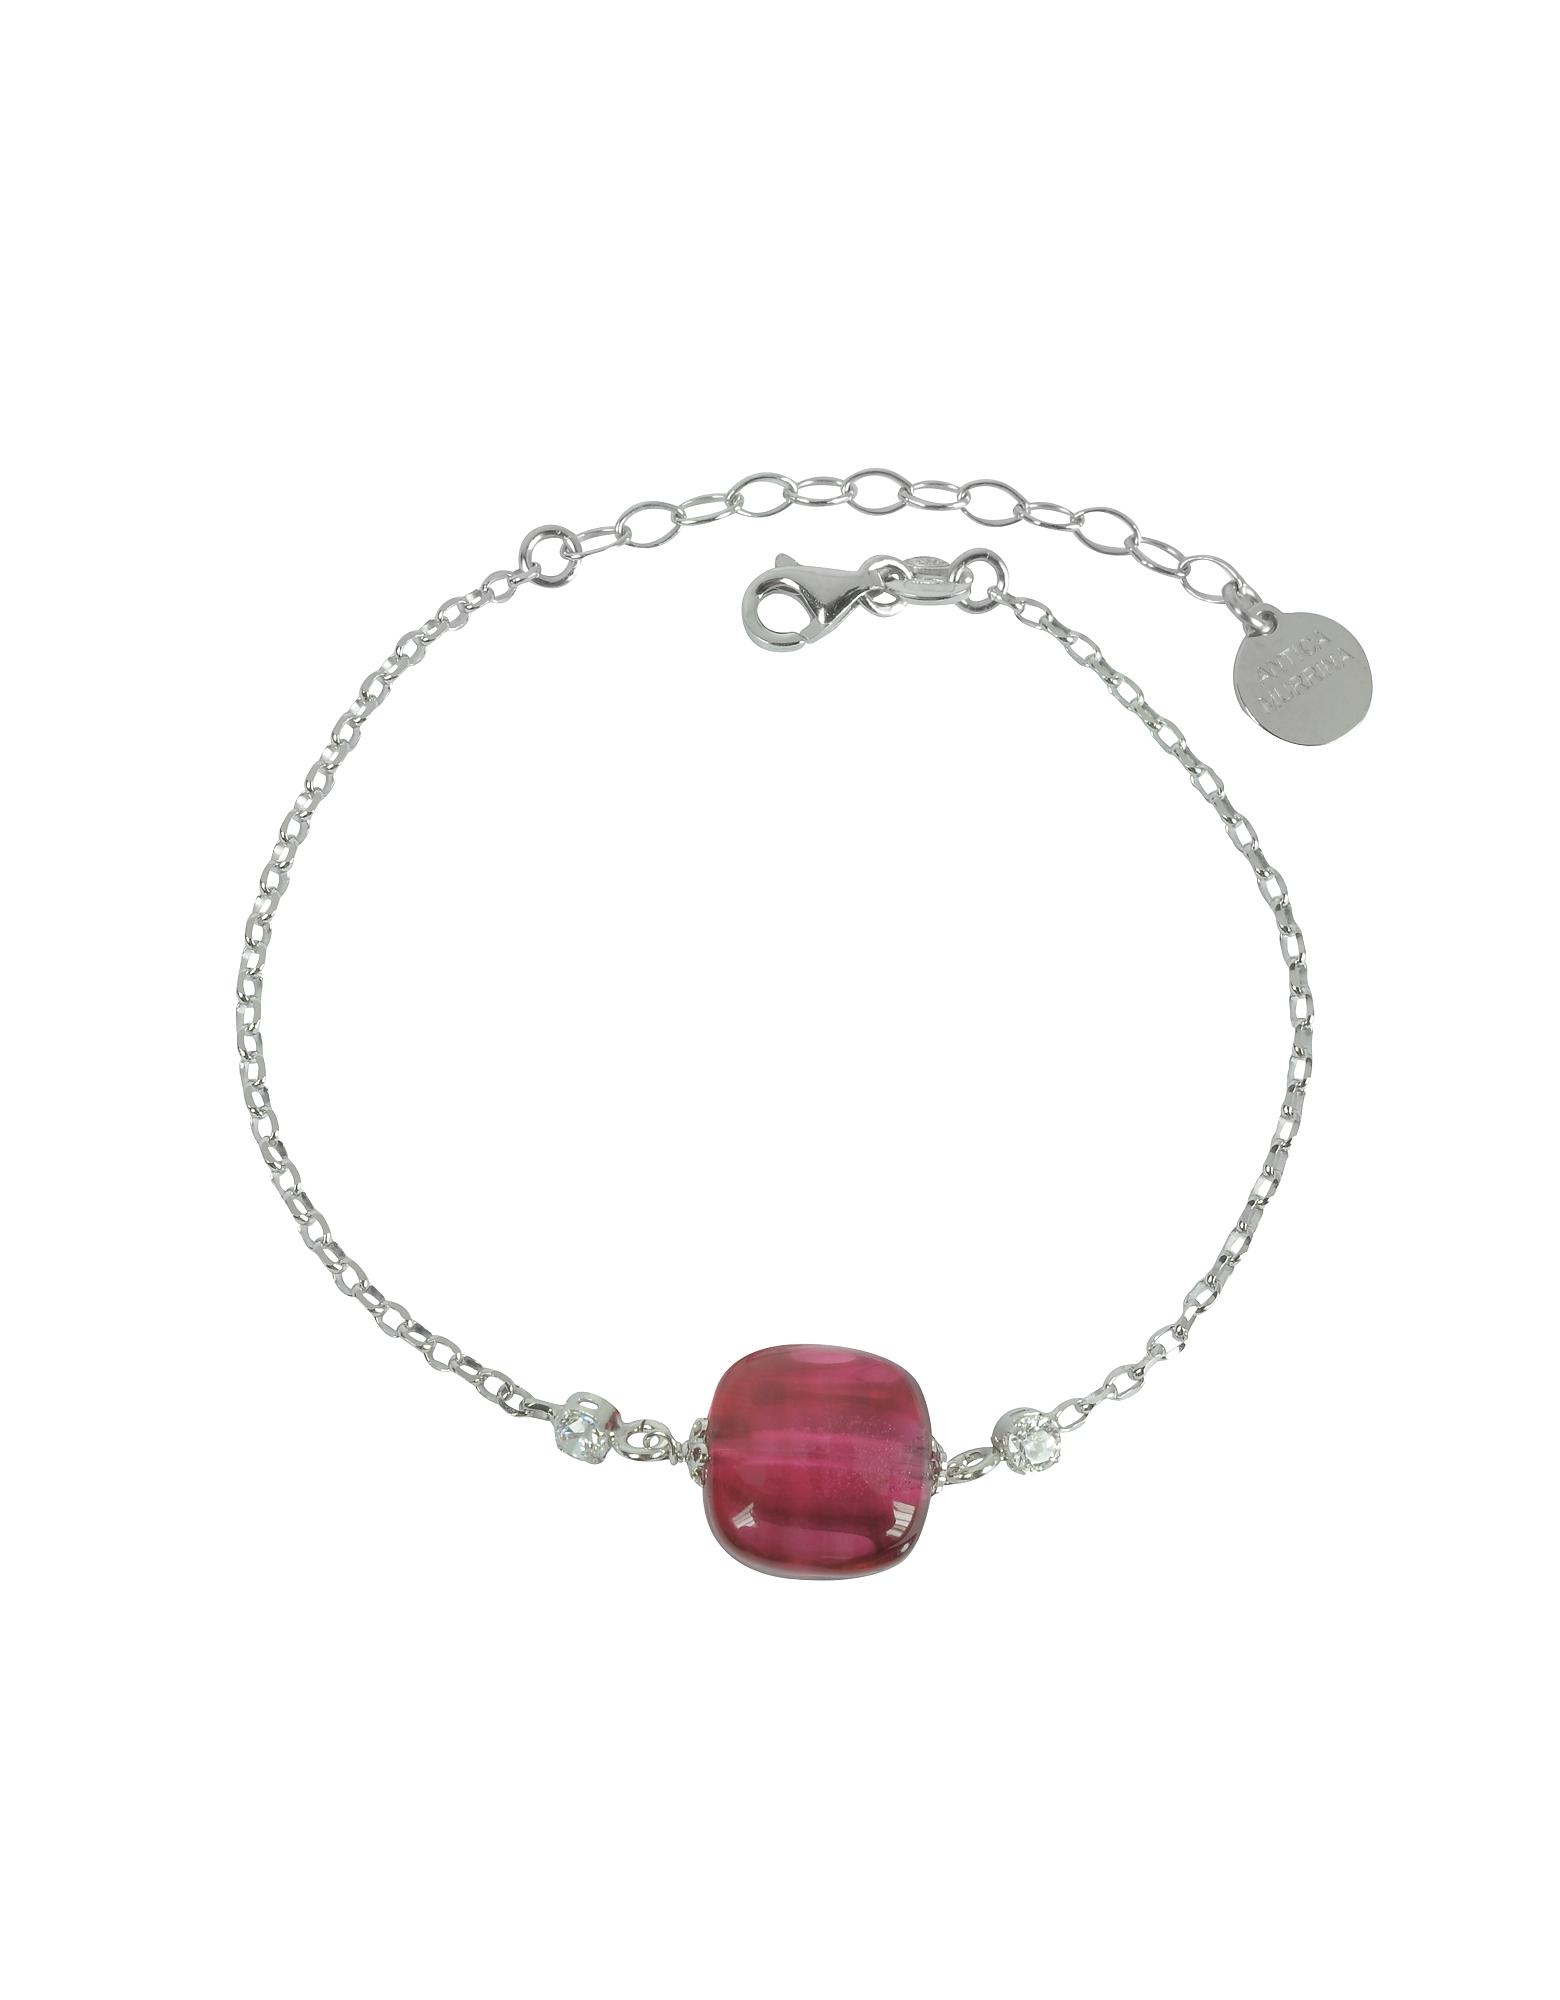 Antica Murrina Bracelets, Florinda Ruby Murano Glass Sterling Silver Bracelet